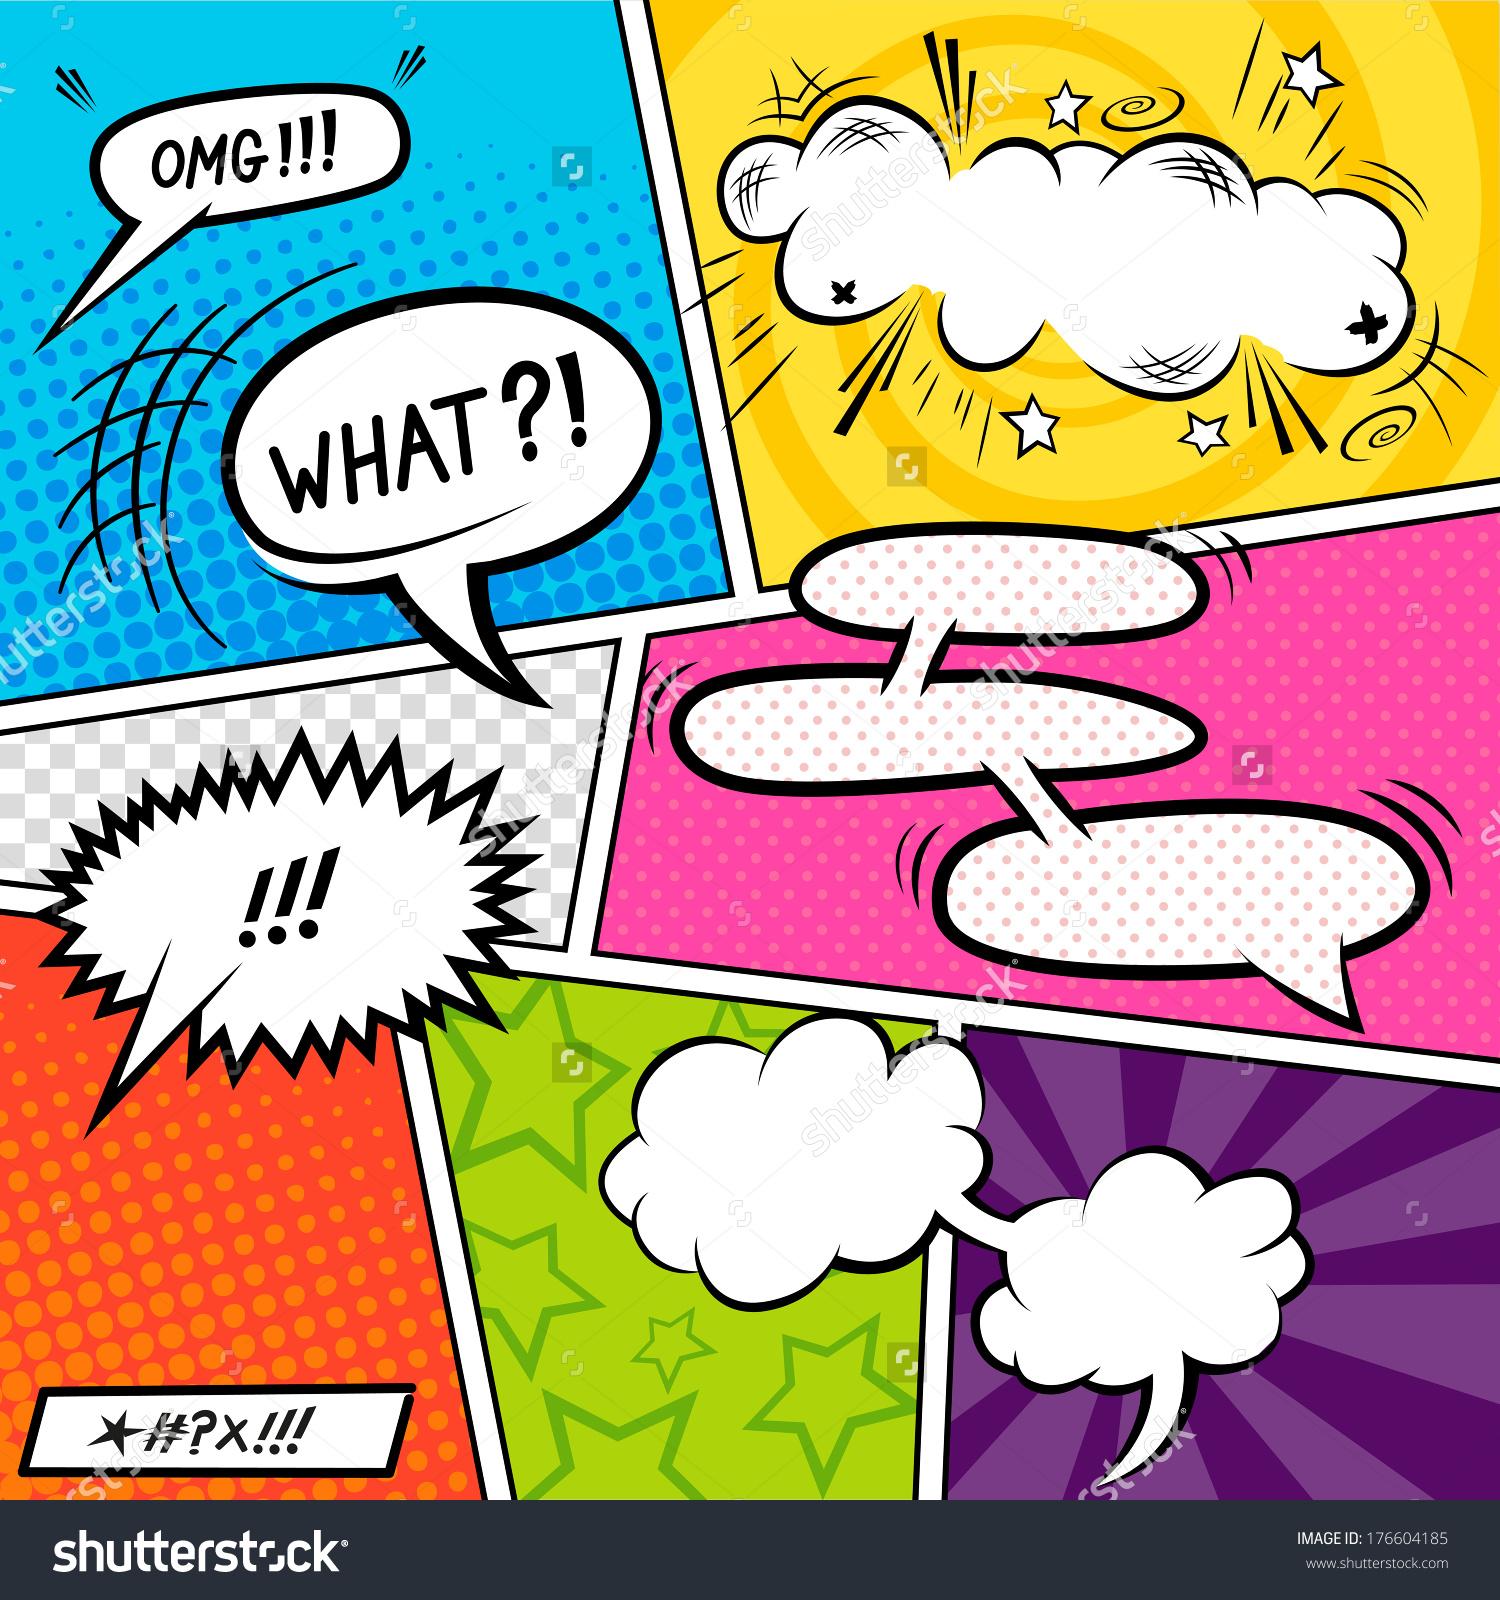 HQ Comic Wallpapers   File 852.23Kb